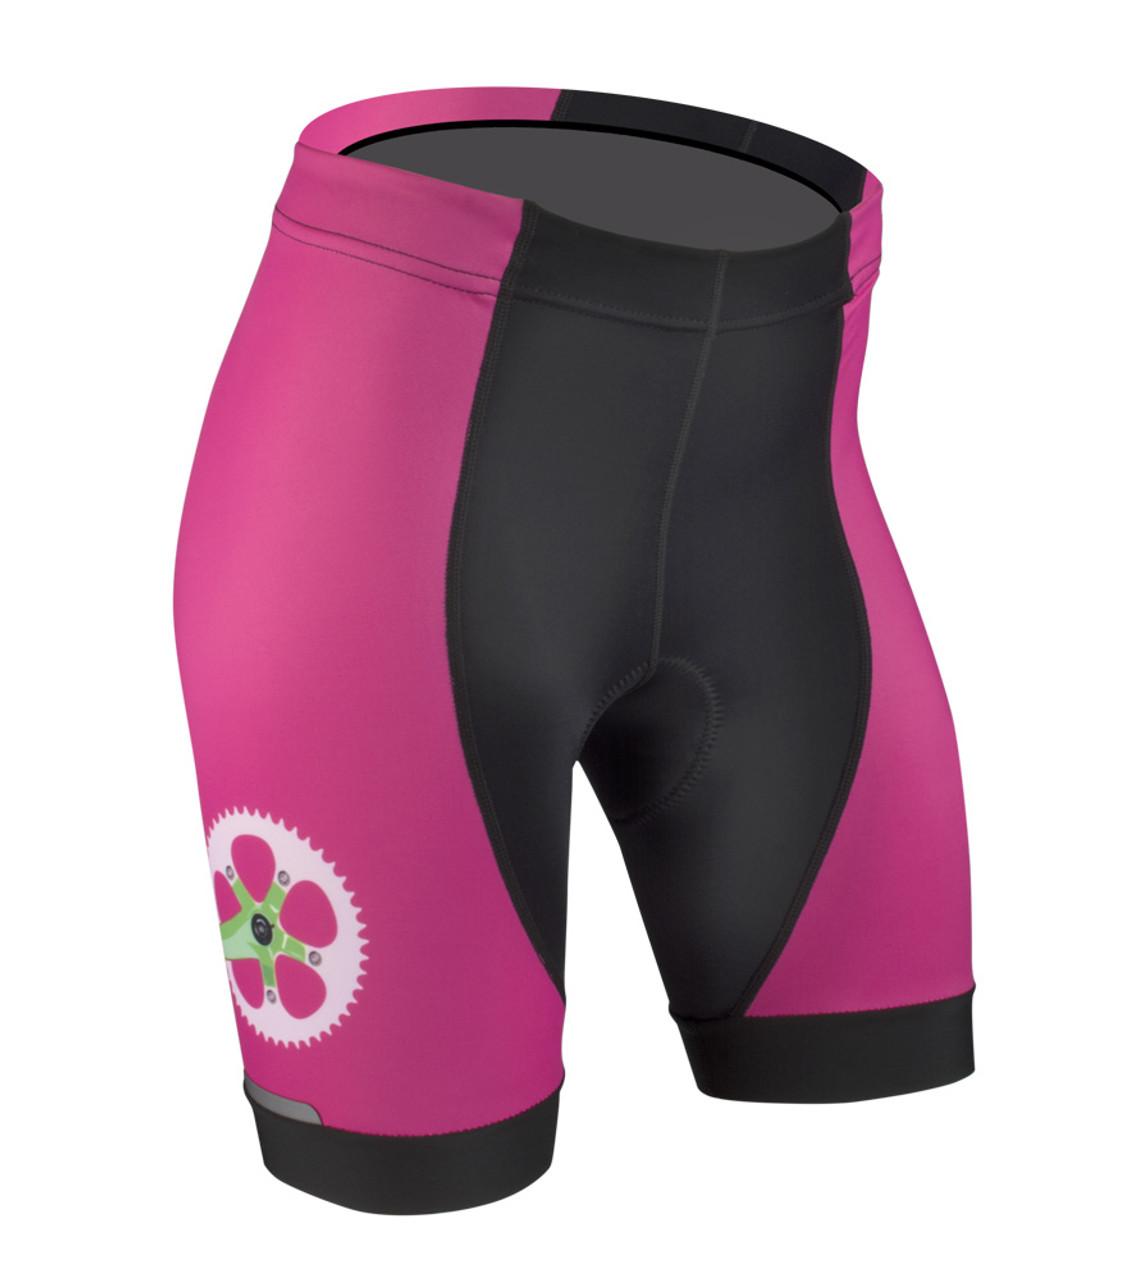 Women s Printed Bike Shorts - Strawbery Fields - Cute Bike Shorts 07d0c1936